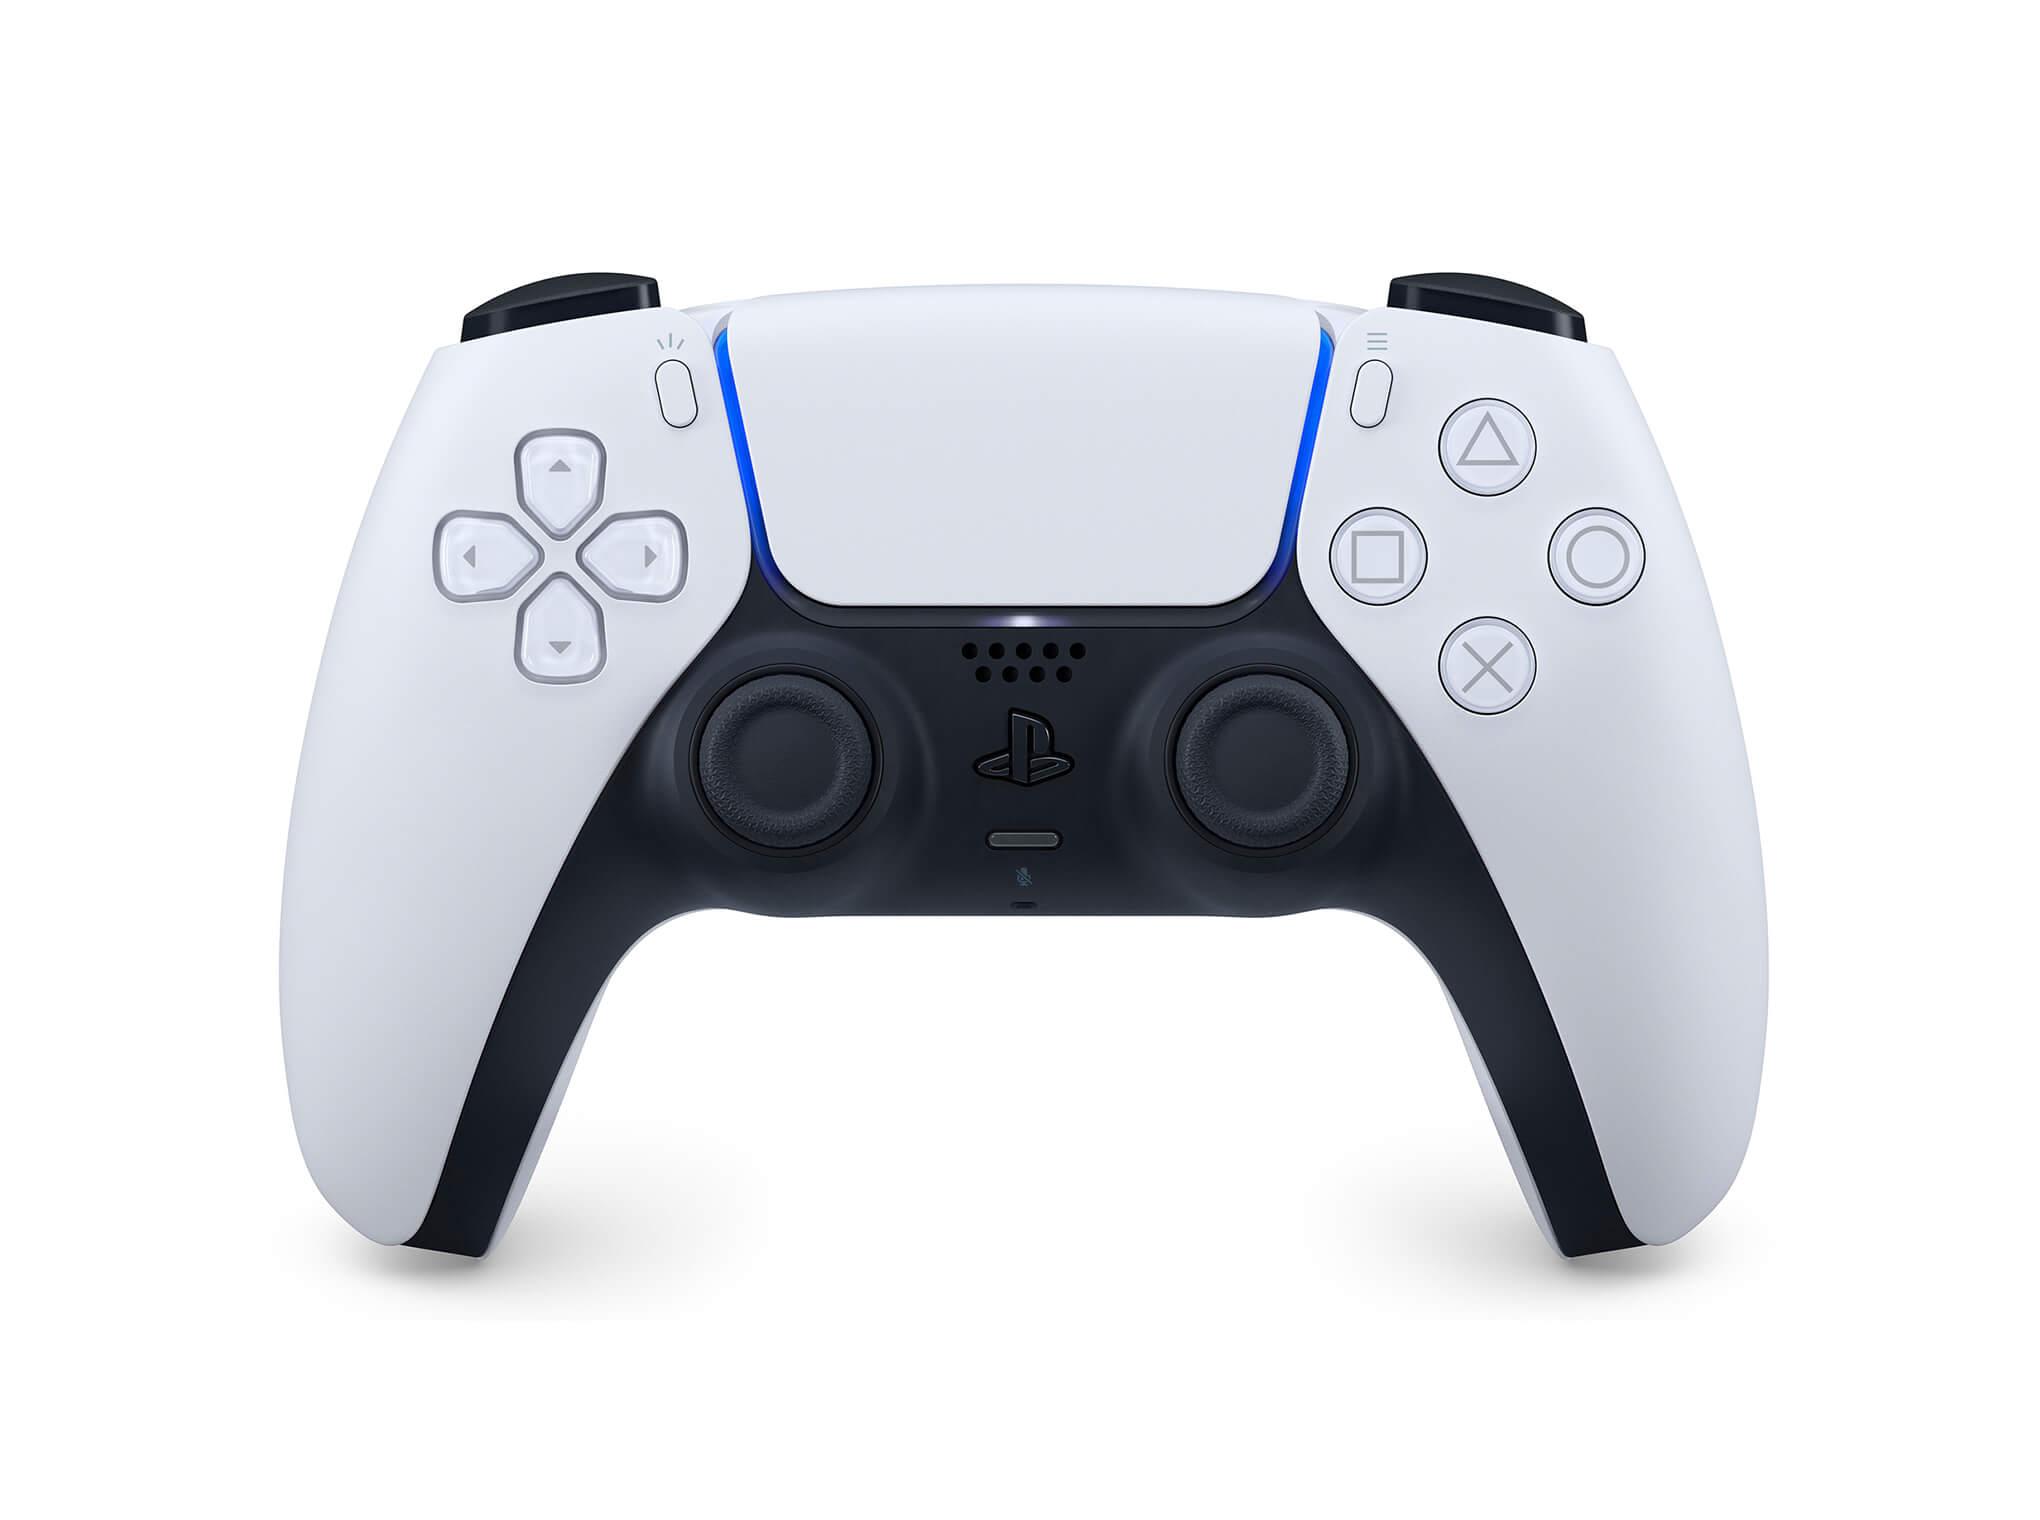 Playstation 5 Controller Sony DualSense